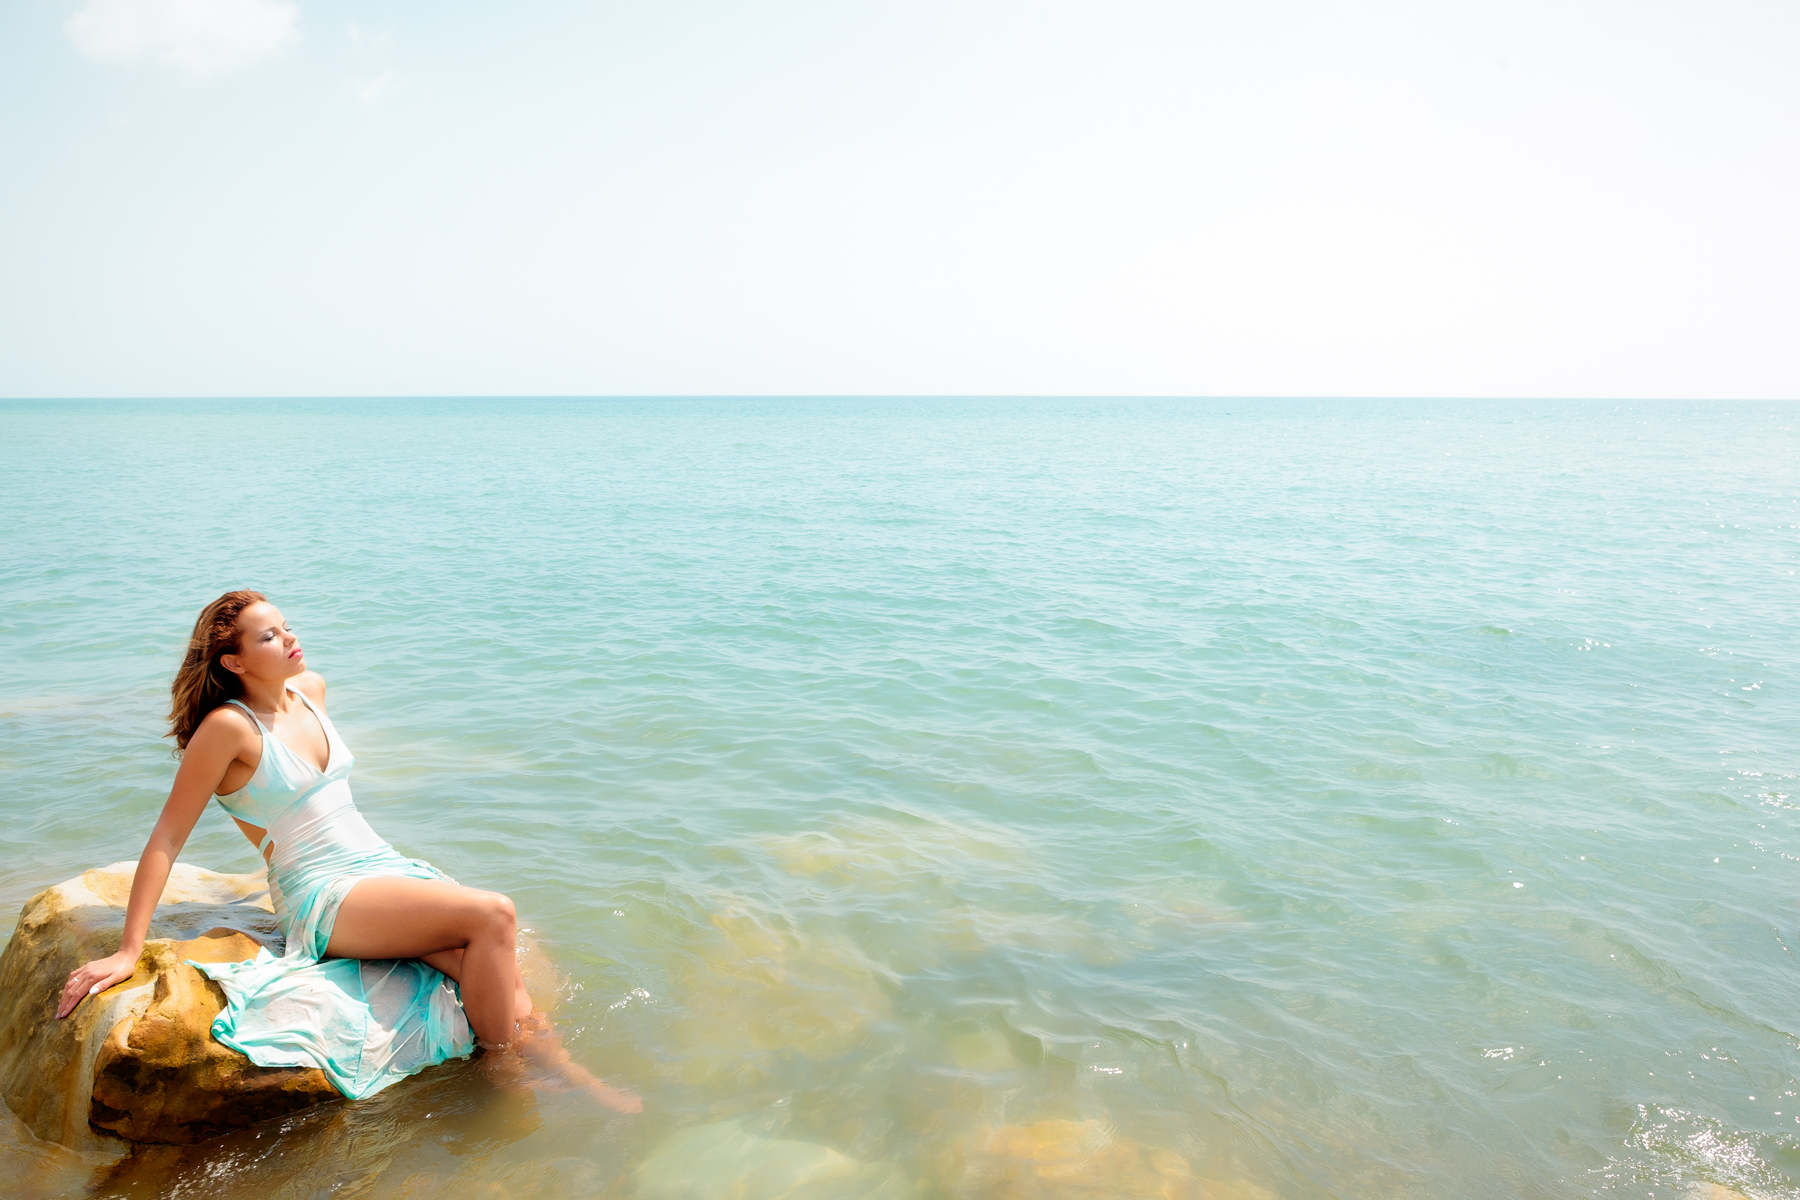 Woman enjoying the sea on a rock